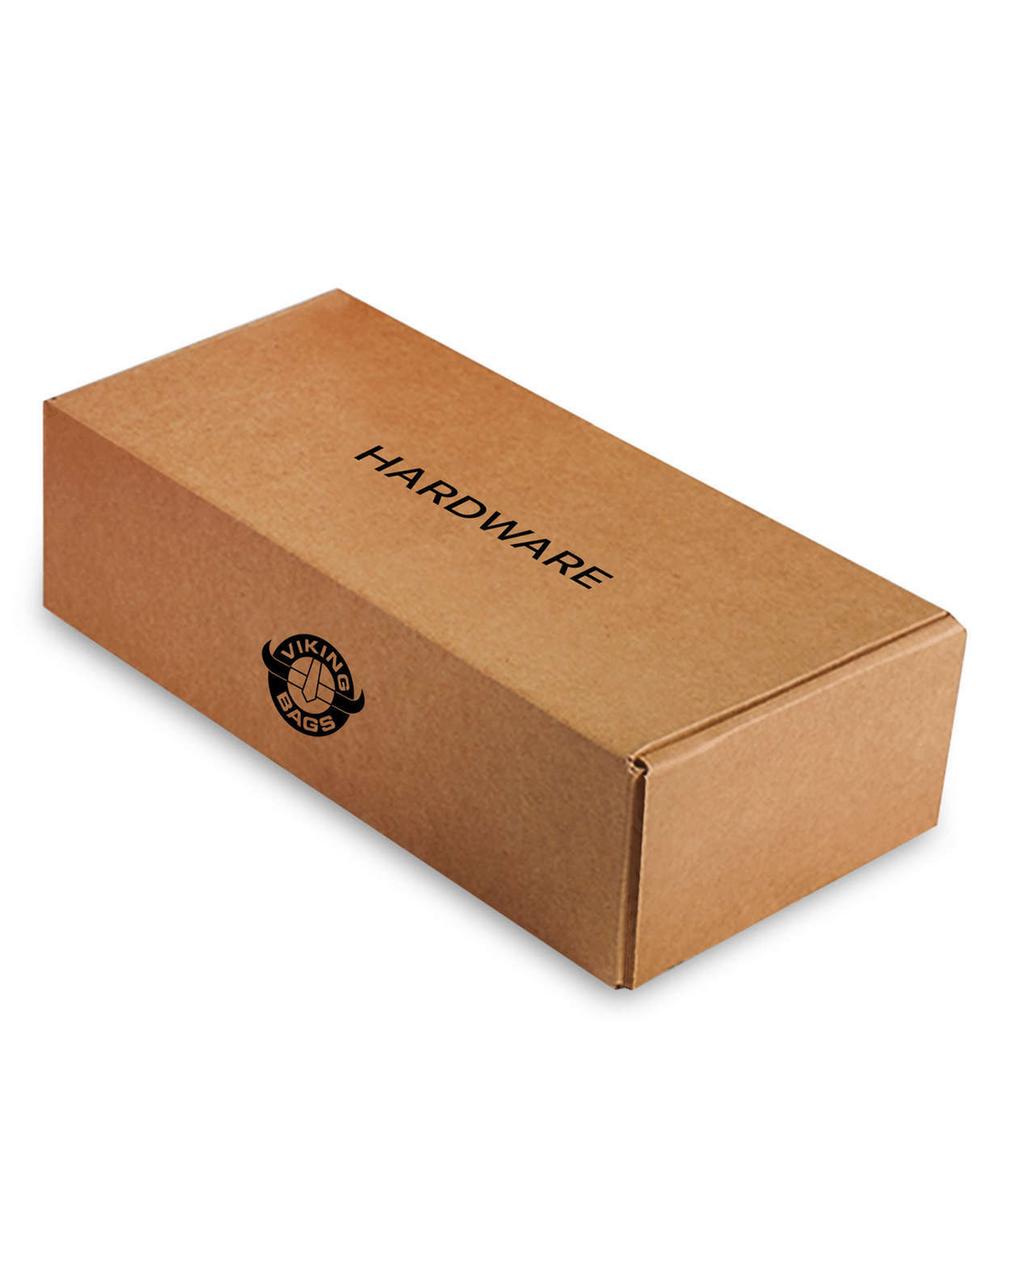 Honda 1500 Valkyrie Standard Uni SS Slanted Studded L Motorcycle saddlebags Hardware Box